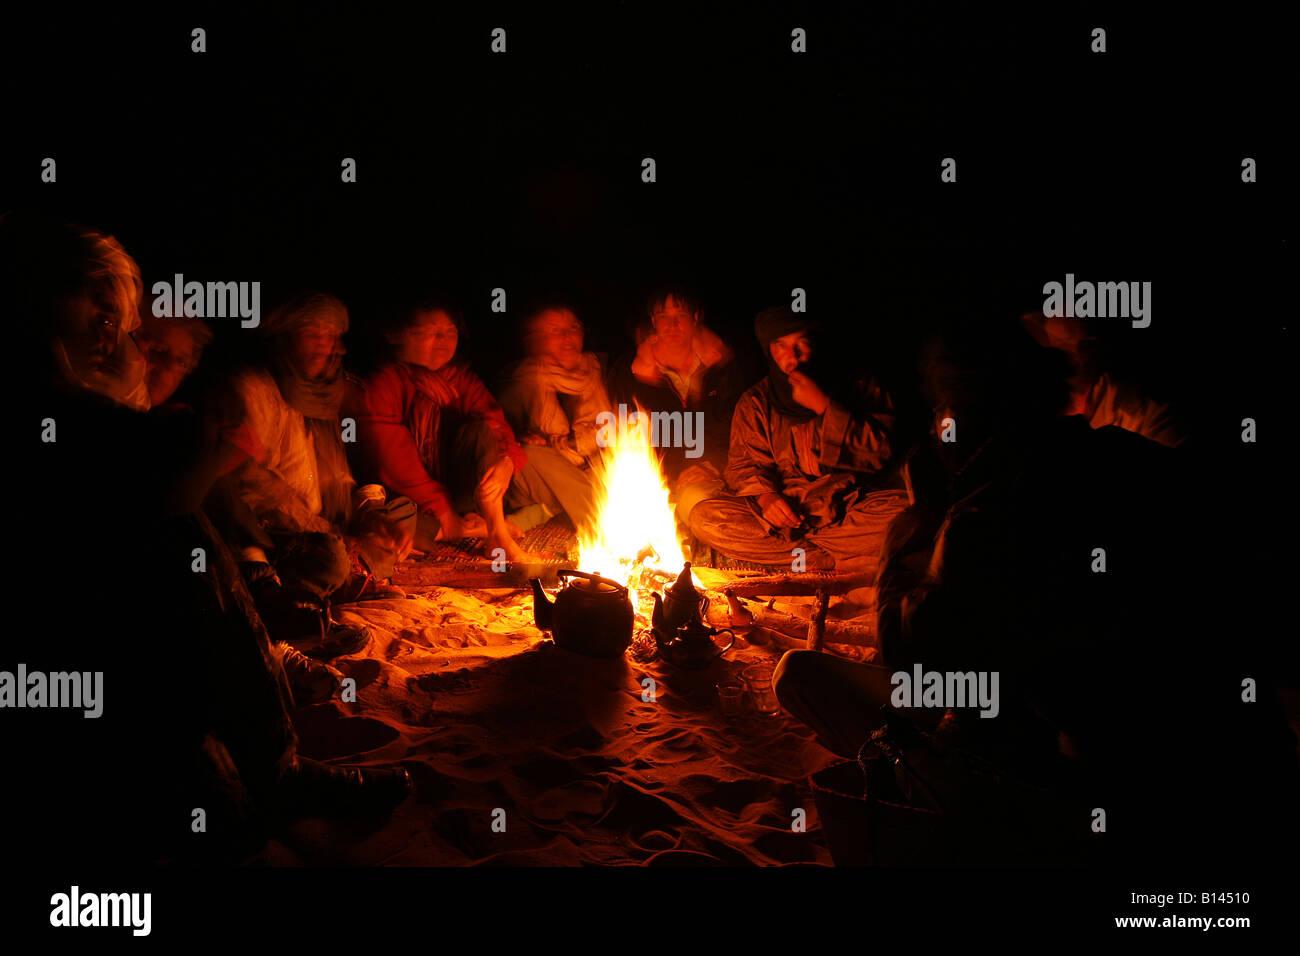 Tuaregs and tourist in Campfire night Oued Tin Tarabine Tassili Ahaggar Sahara desert Algeria - Stock Image